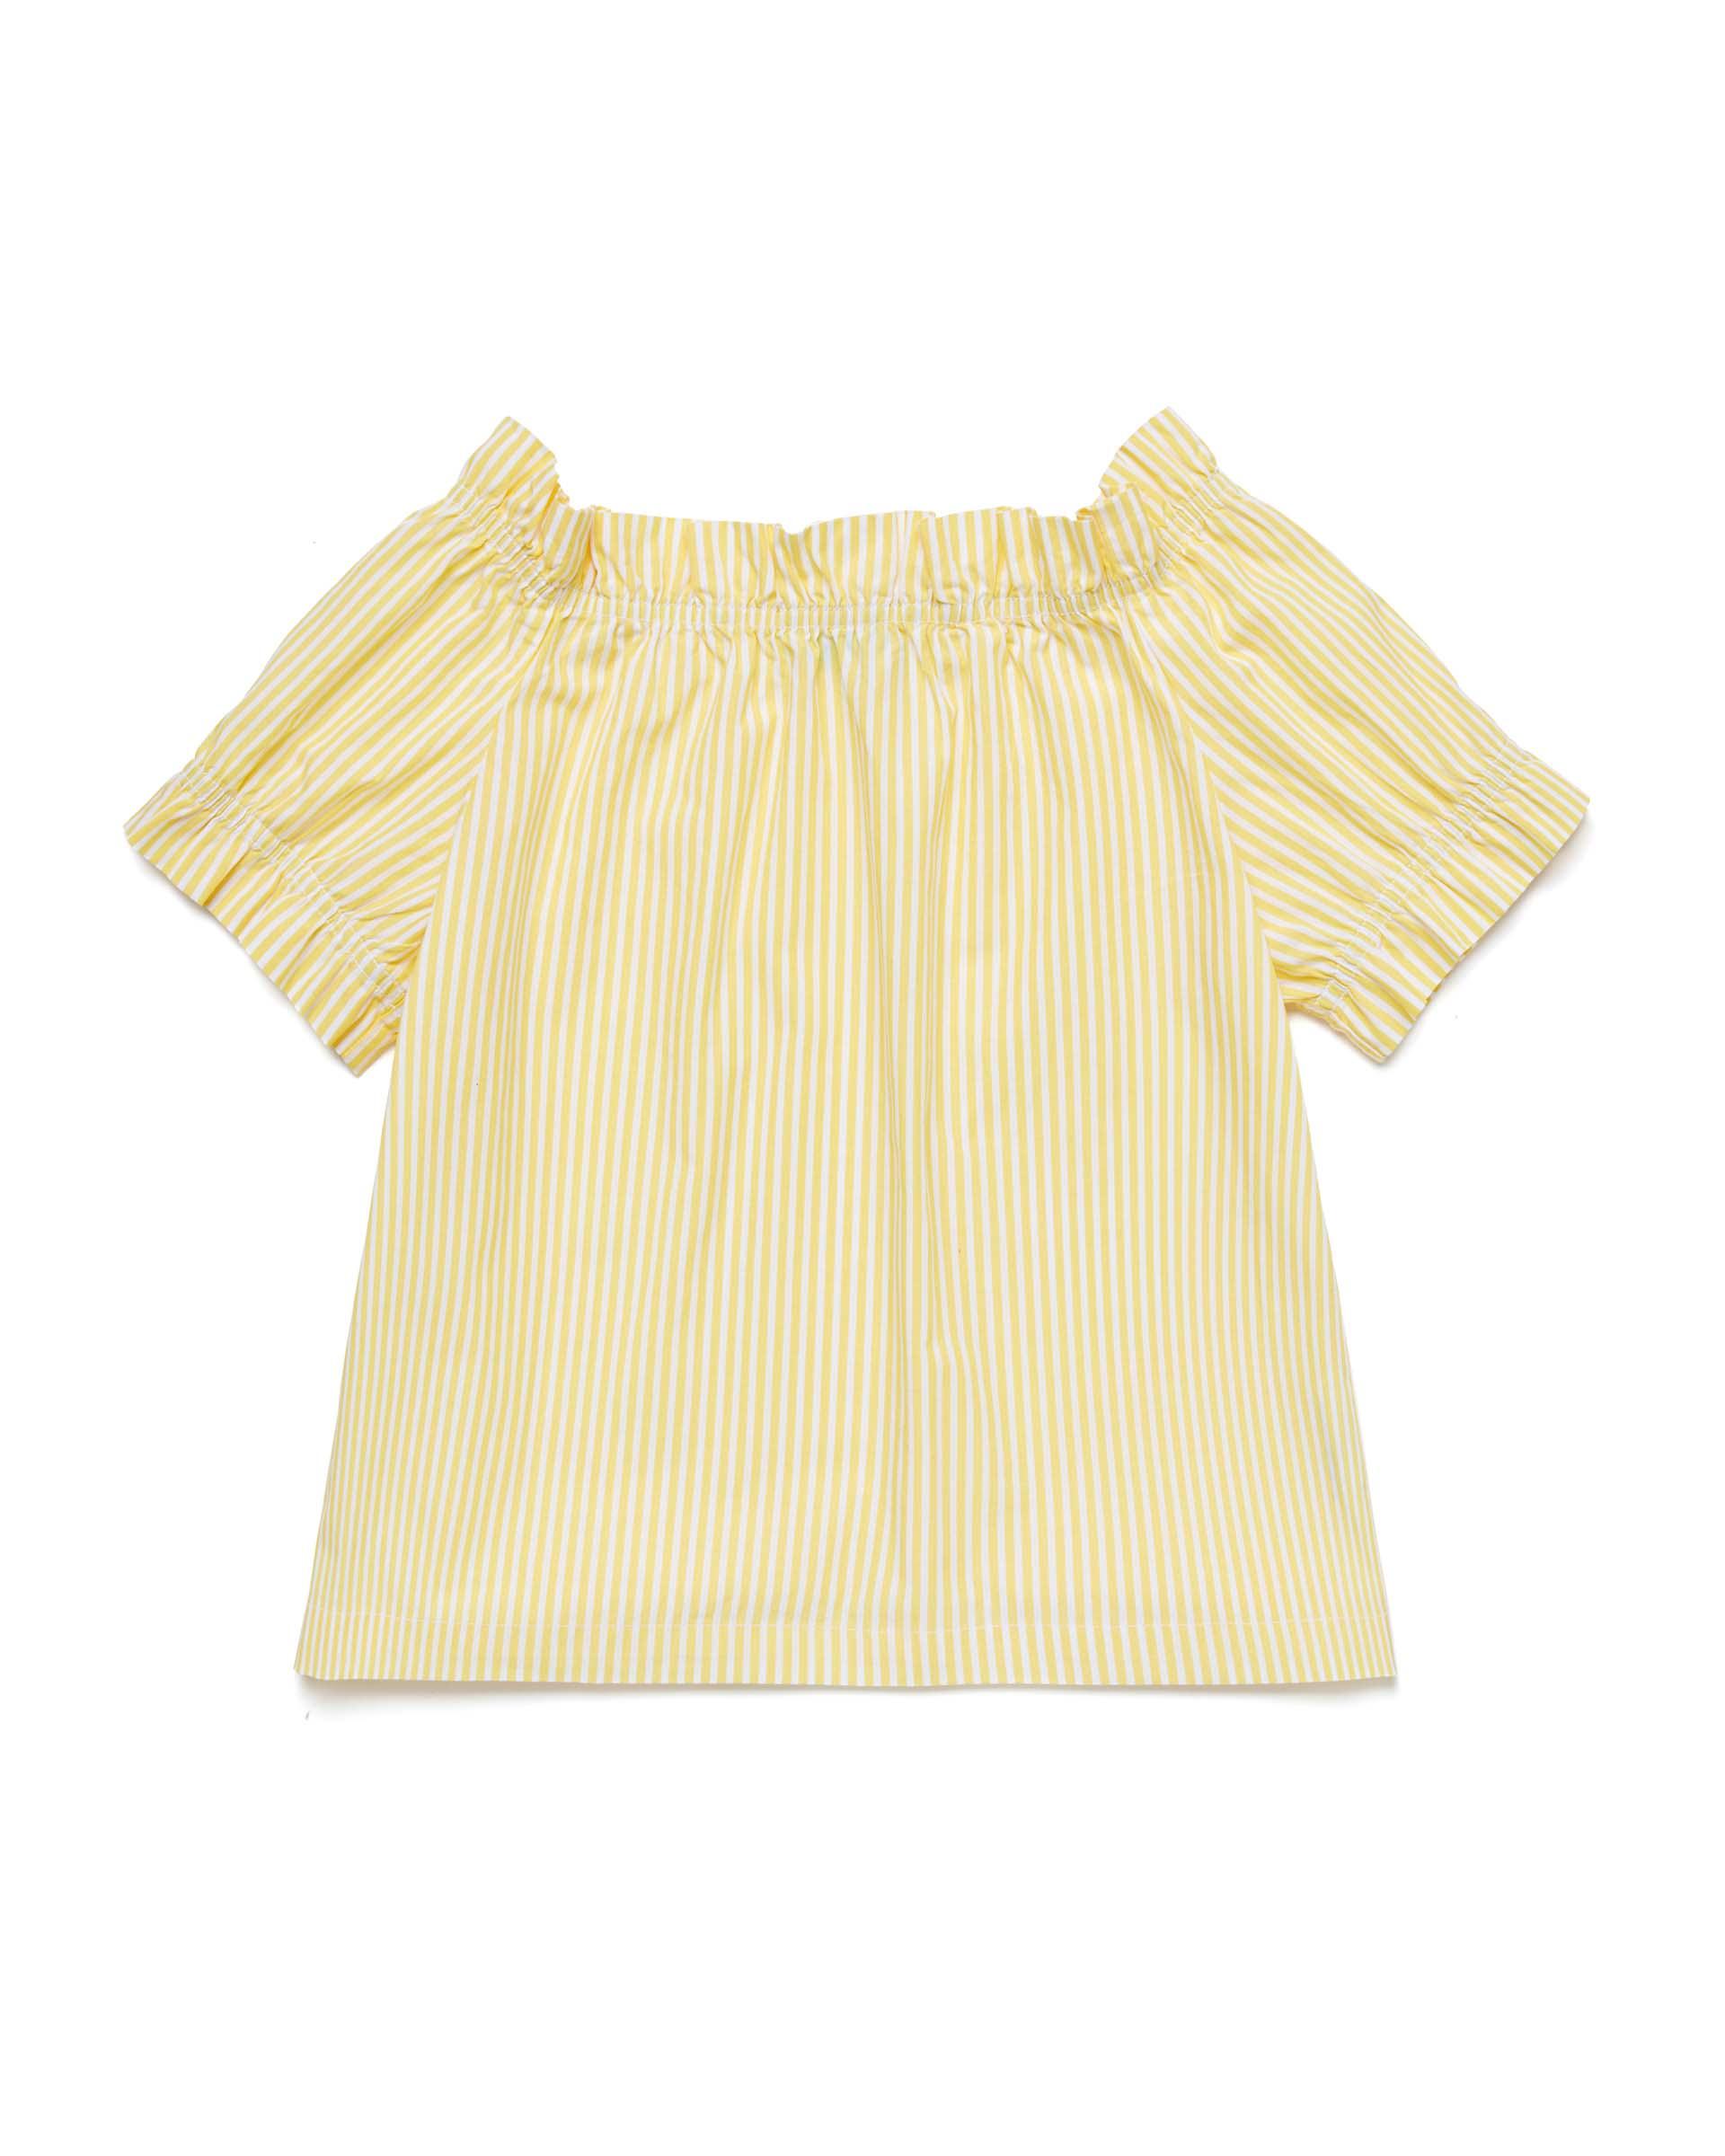 Купить 20P_5OT65QH40_902, Блуза для девочек Benetton 5OT65QH40_902 р-р 122, United Colors of Benetton, Блузки для девочек